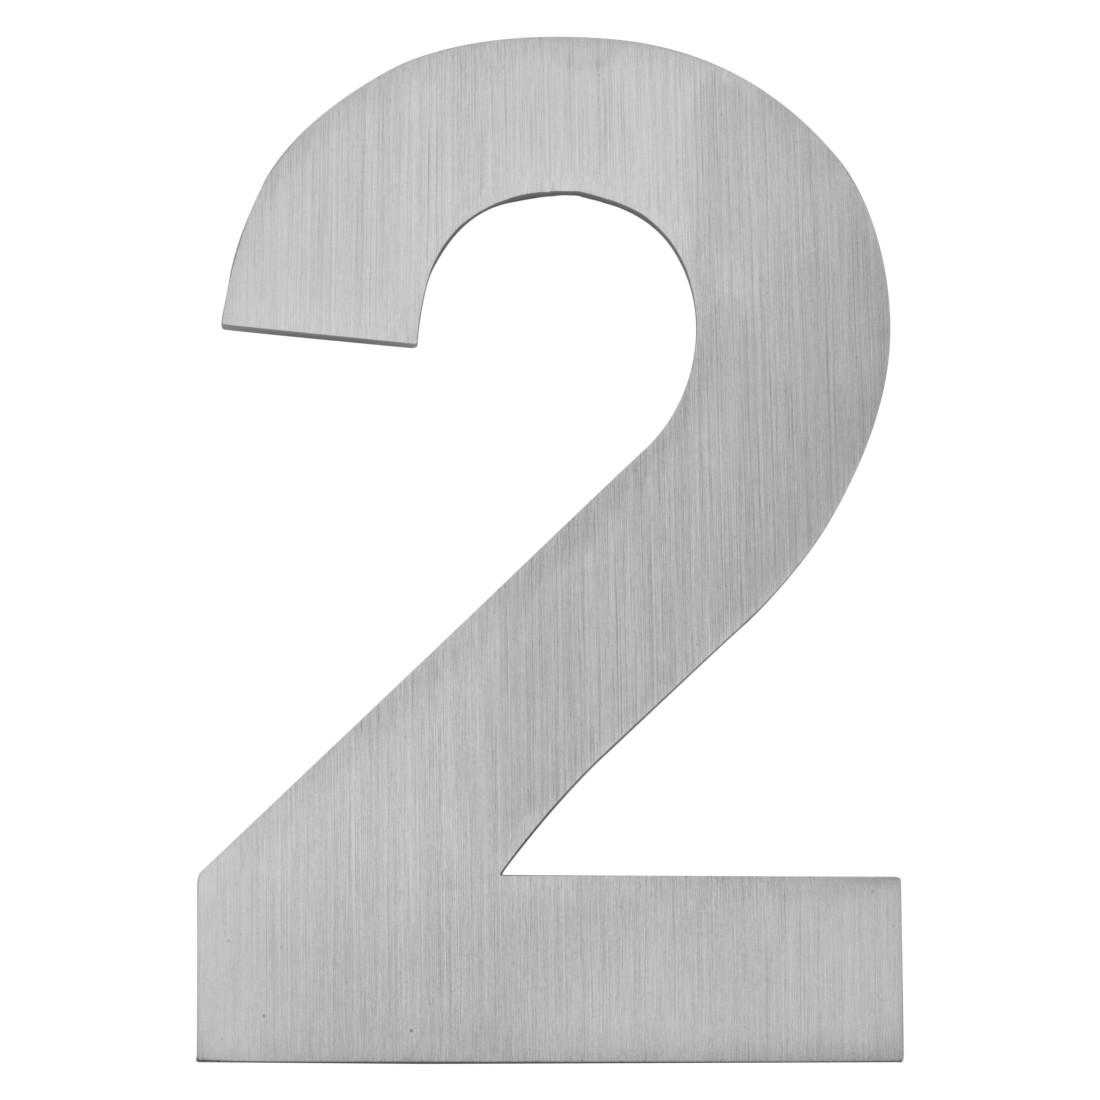 Hausnummer zum Aufschrauben 2 - Matt Gebürstet Edelstahl Matt Gebürstet Silber, Serafini